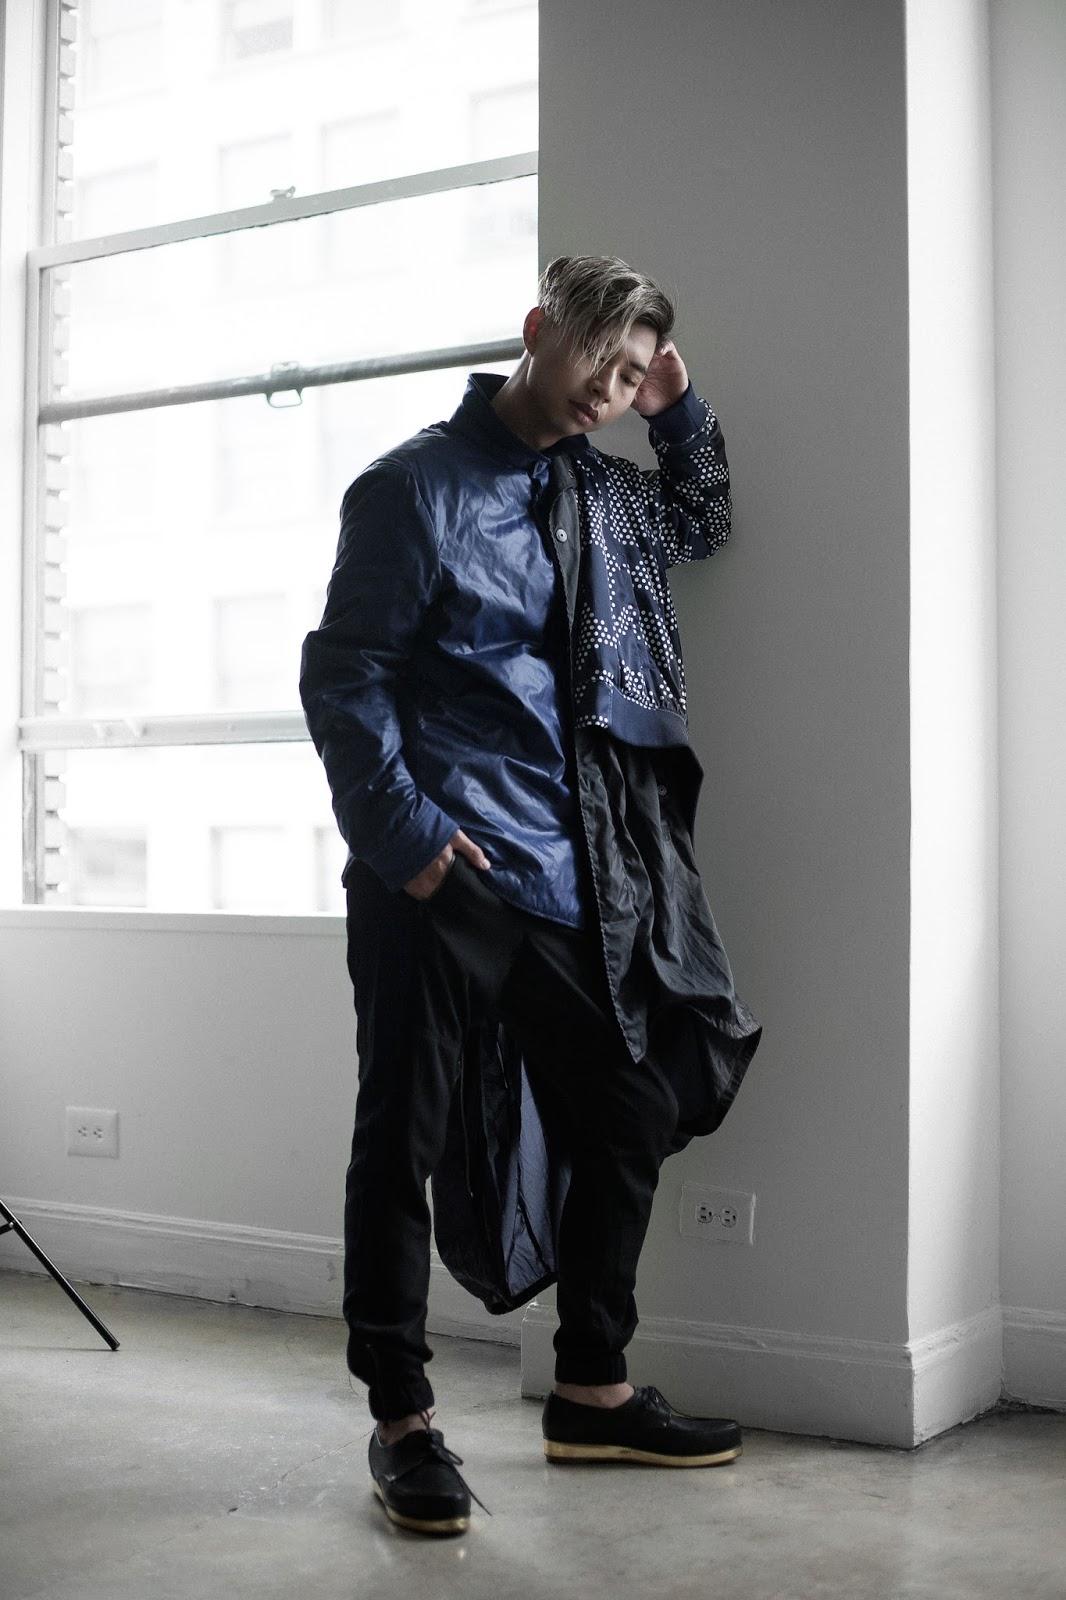 mybelonging-tommylei-facade-magazine-menswear-editorial1.jpg